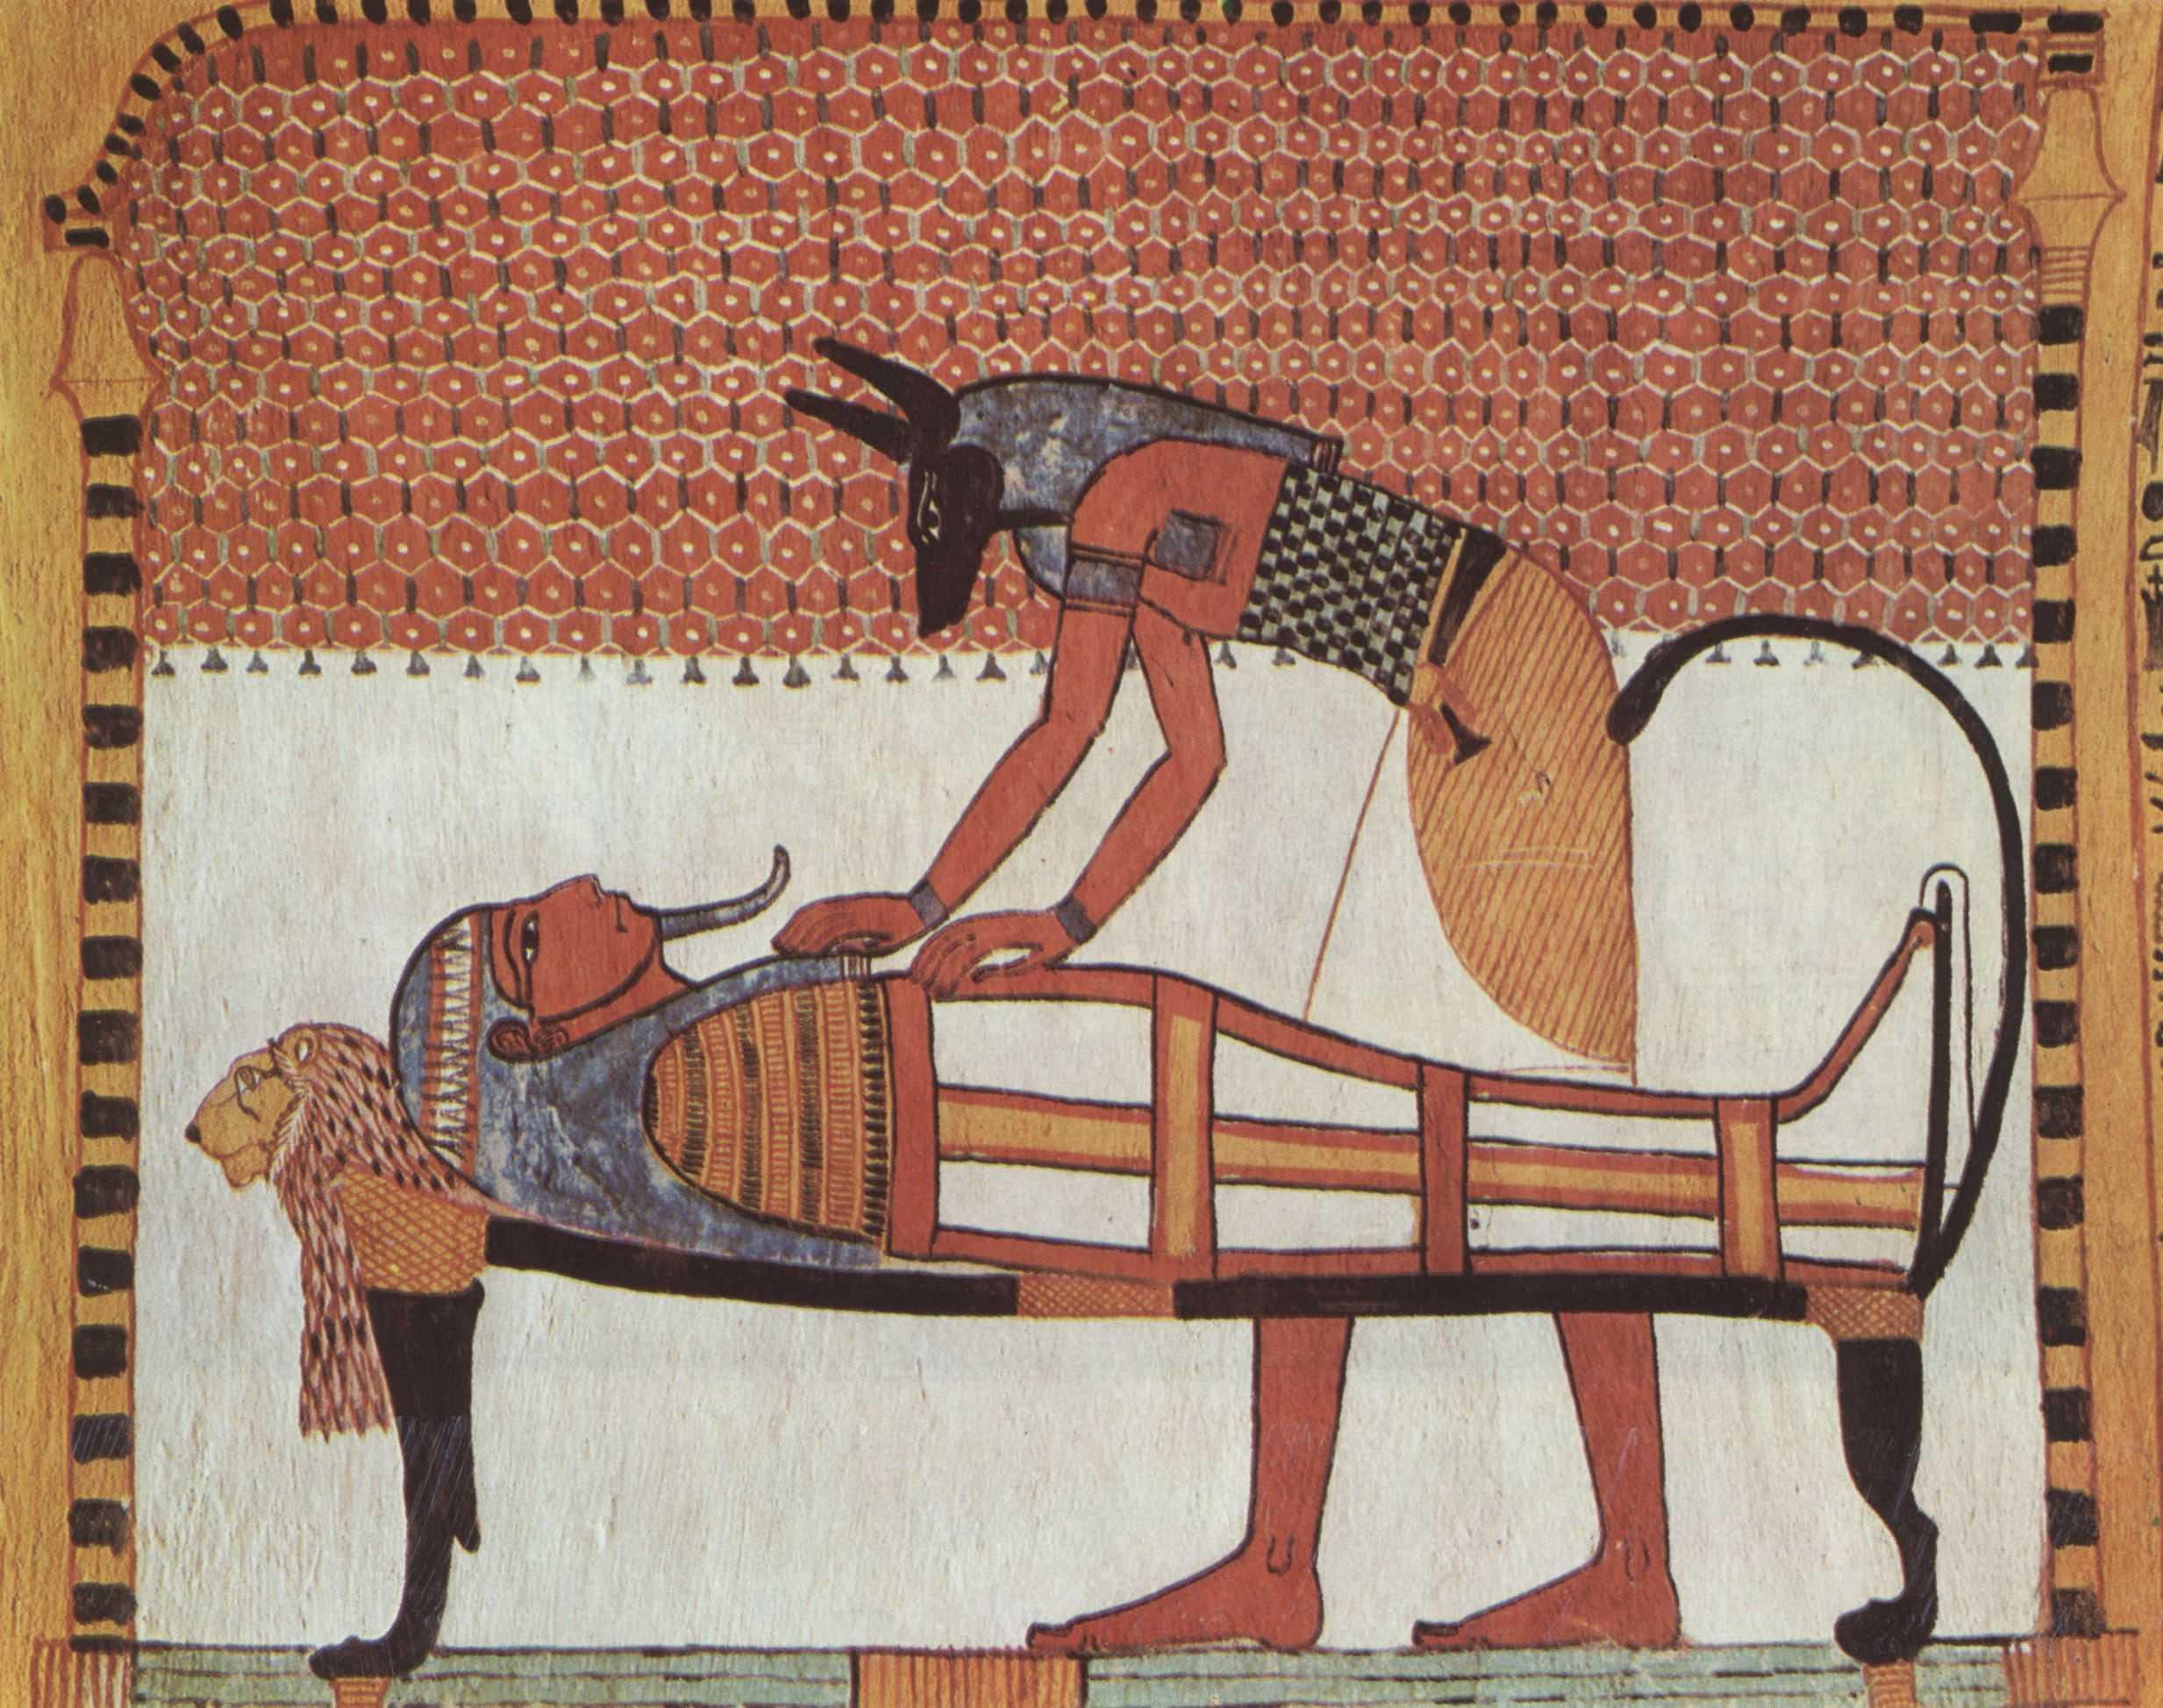 Der Mumifizierungsprozess